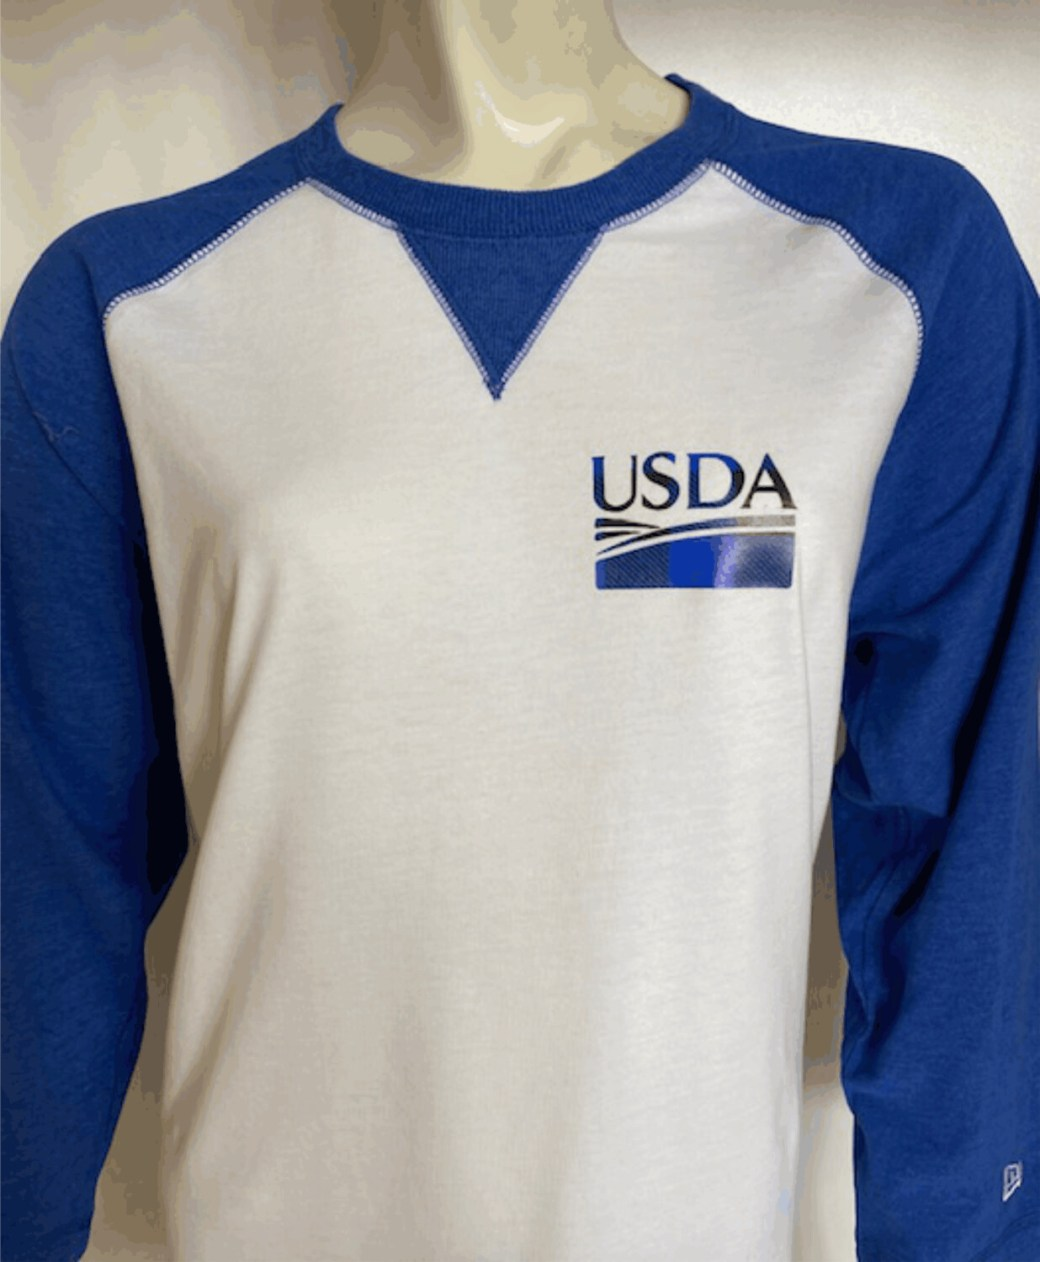 Unisex New Era Sueded Cotton Blend 3/4-Sleeve Baseball Raglan Tee Buffalo Plaid USDA Logo